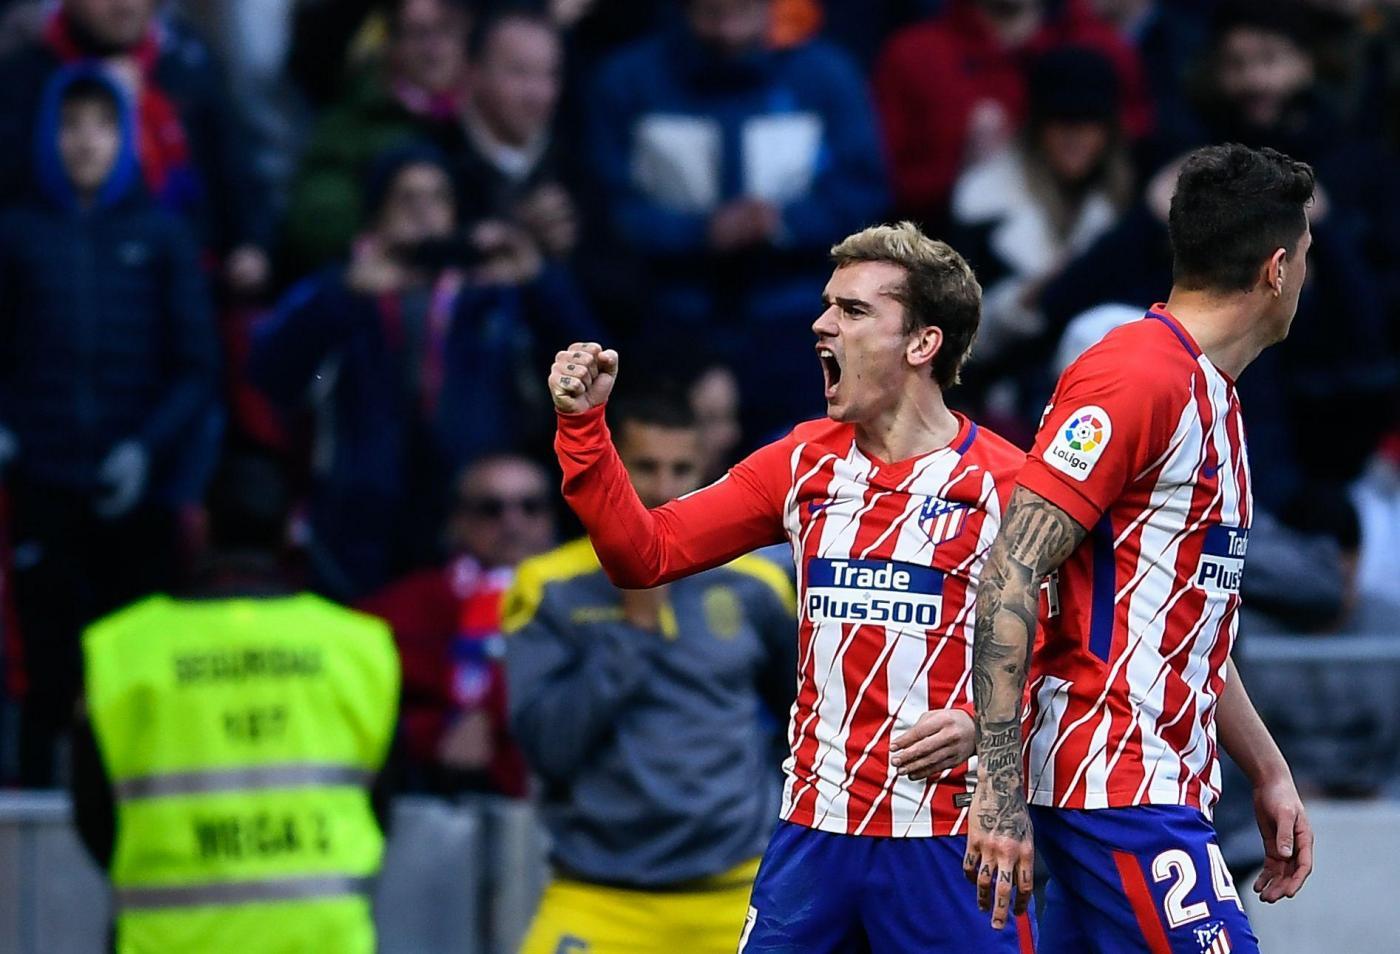 Real Sociedad-Atletico Madrid giovedì 19 aprile, analisi e pronostico LaLiga